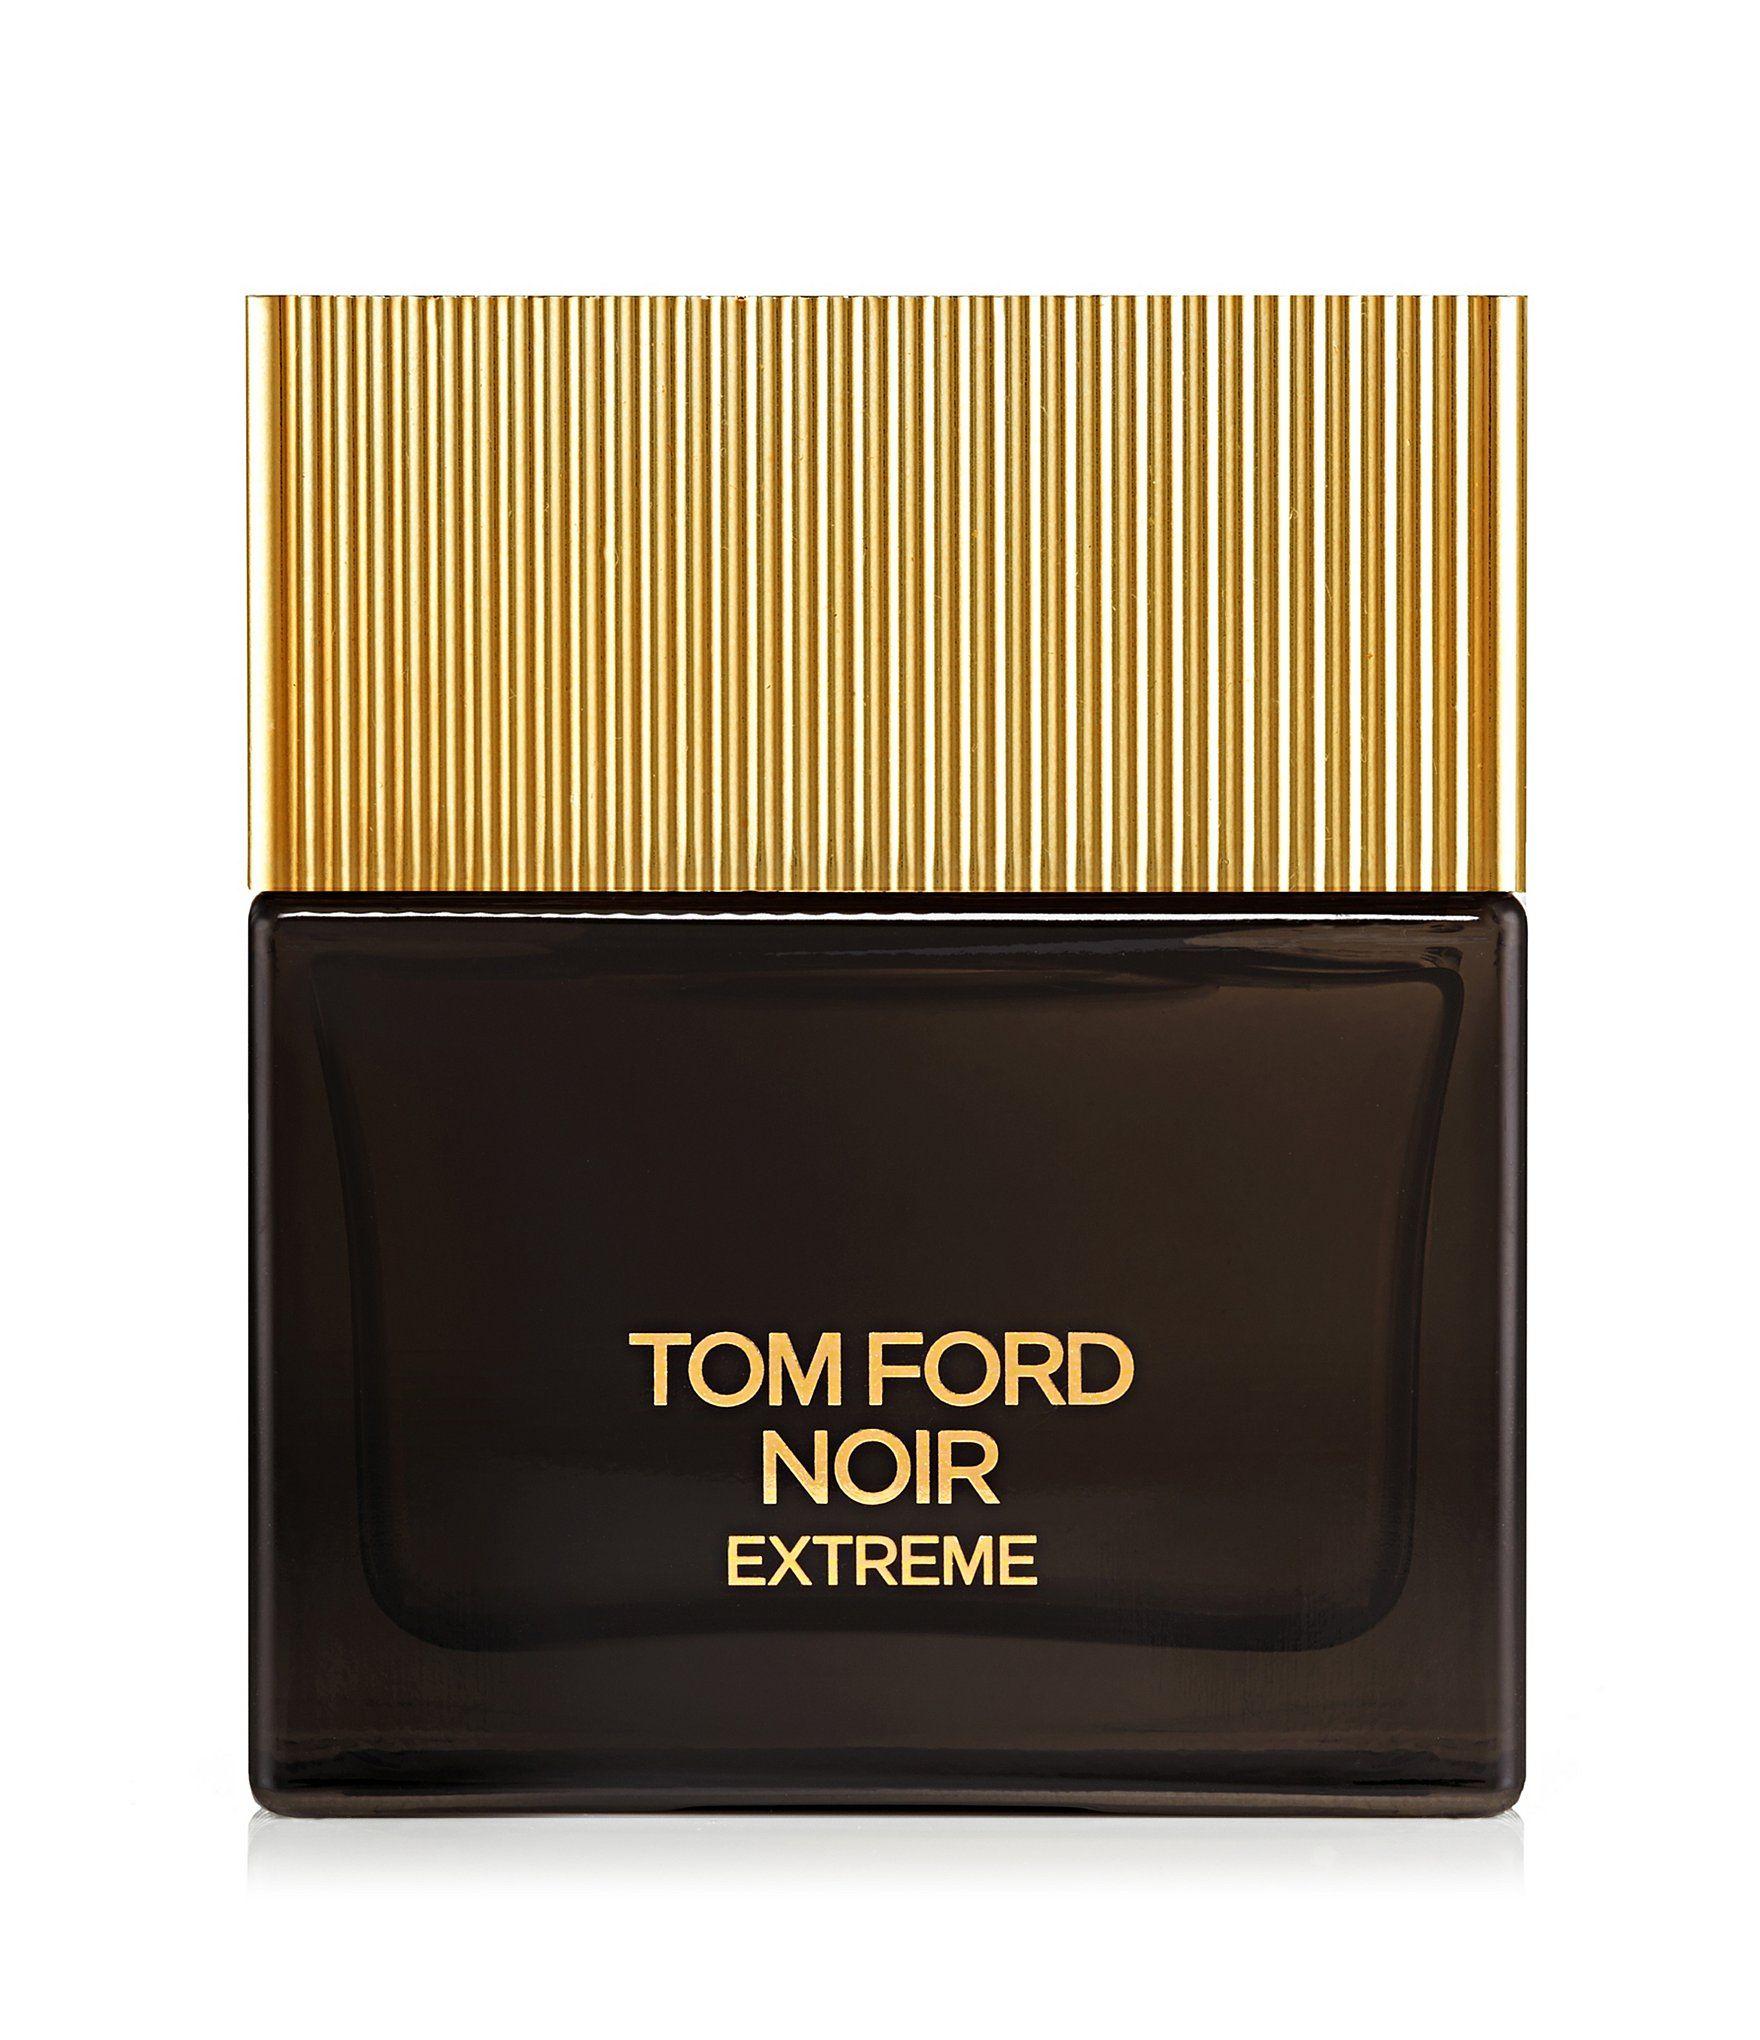 Tom Ford Noir Extreme Eau De Parfum Dillard S Tom Ford Perfume Tom Ford Men S Grooming